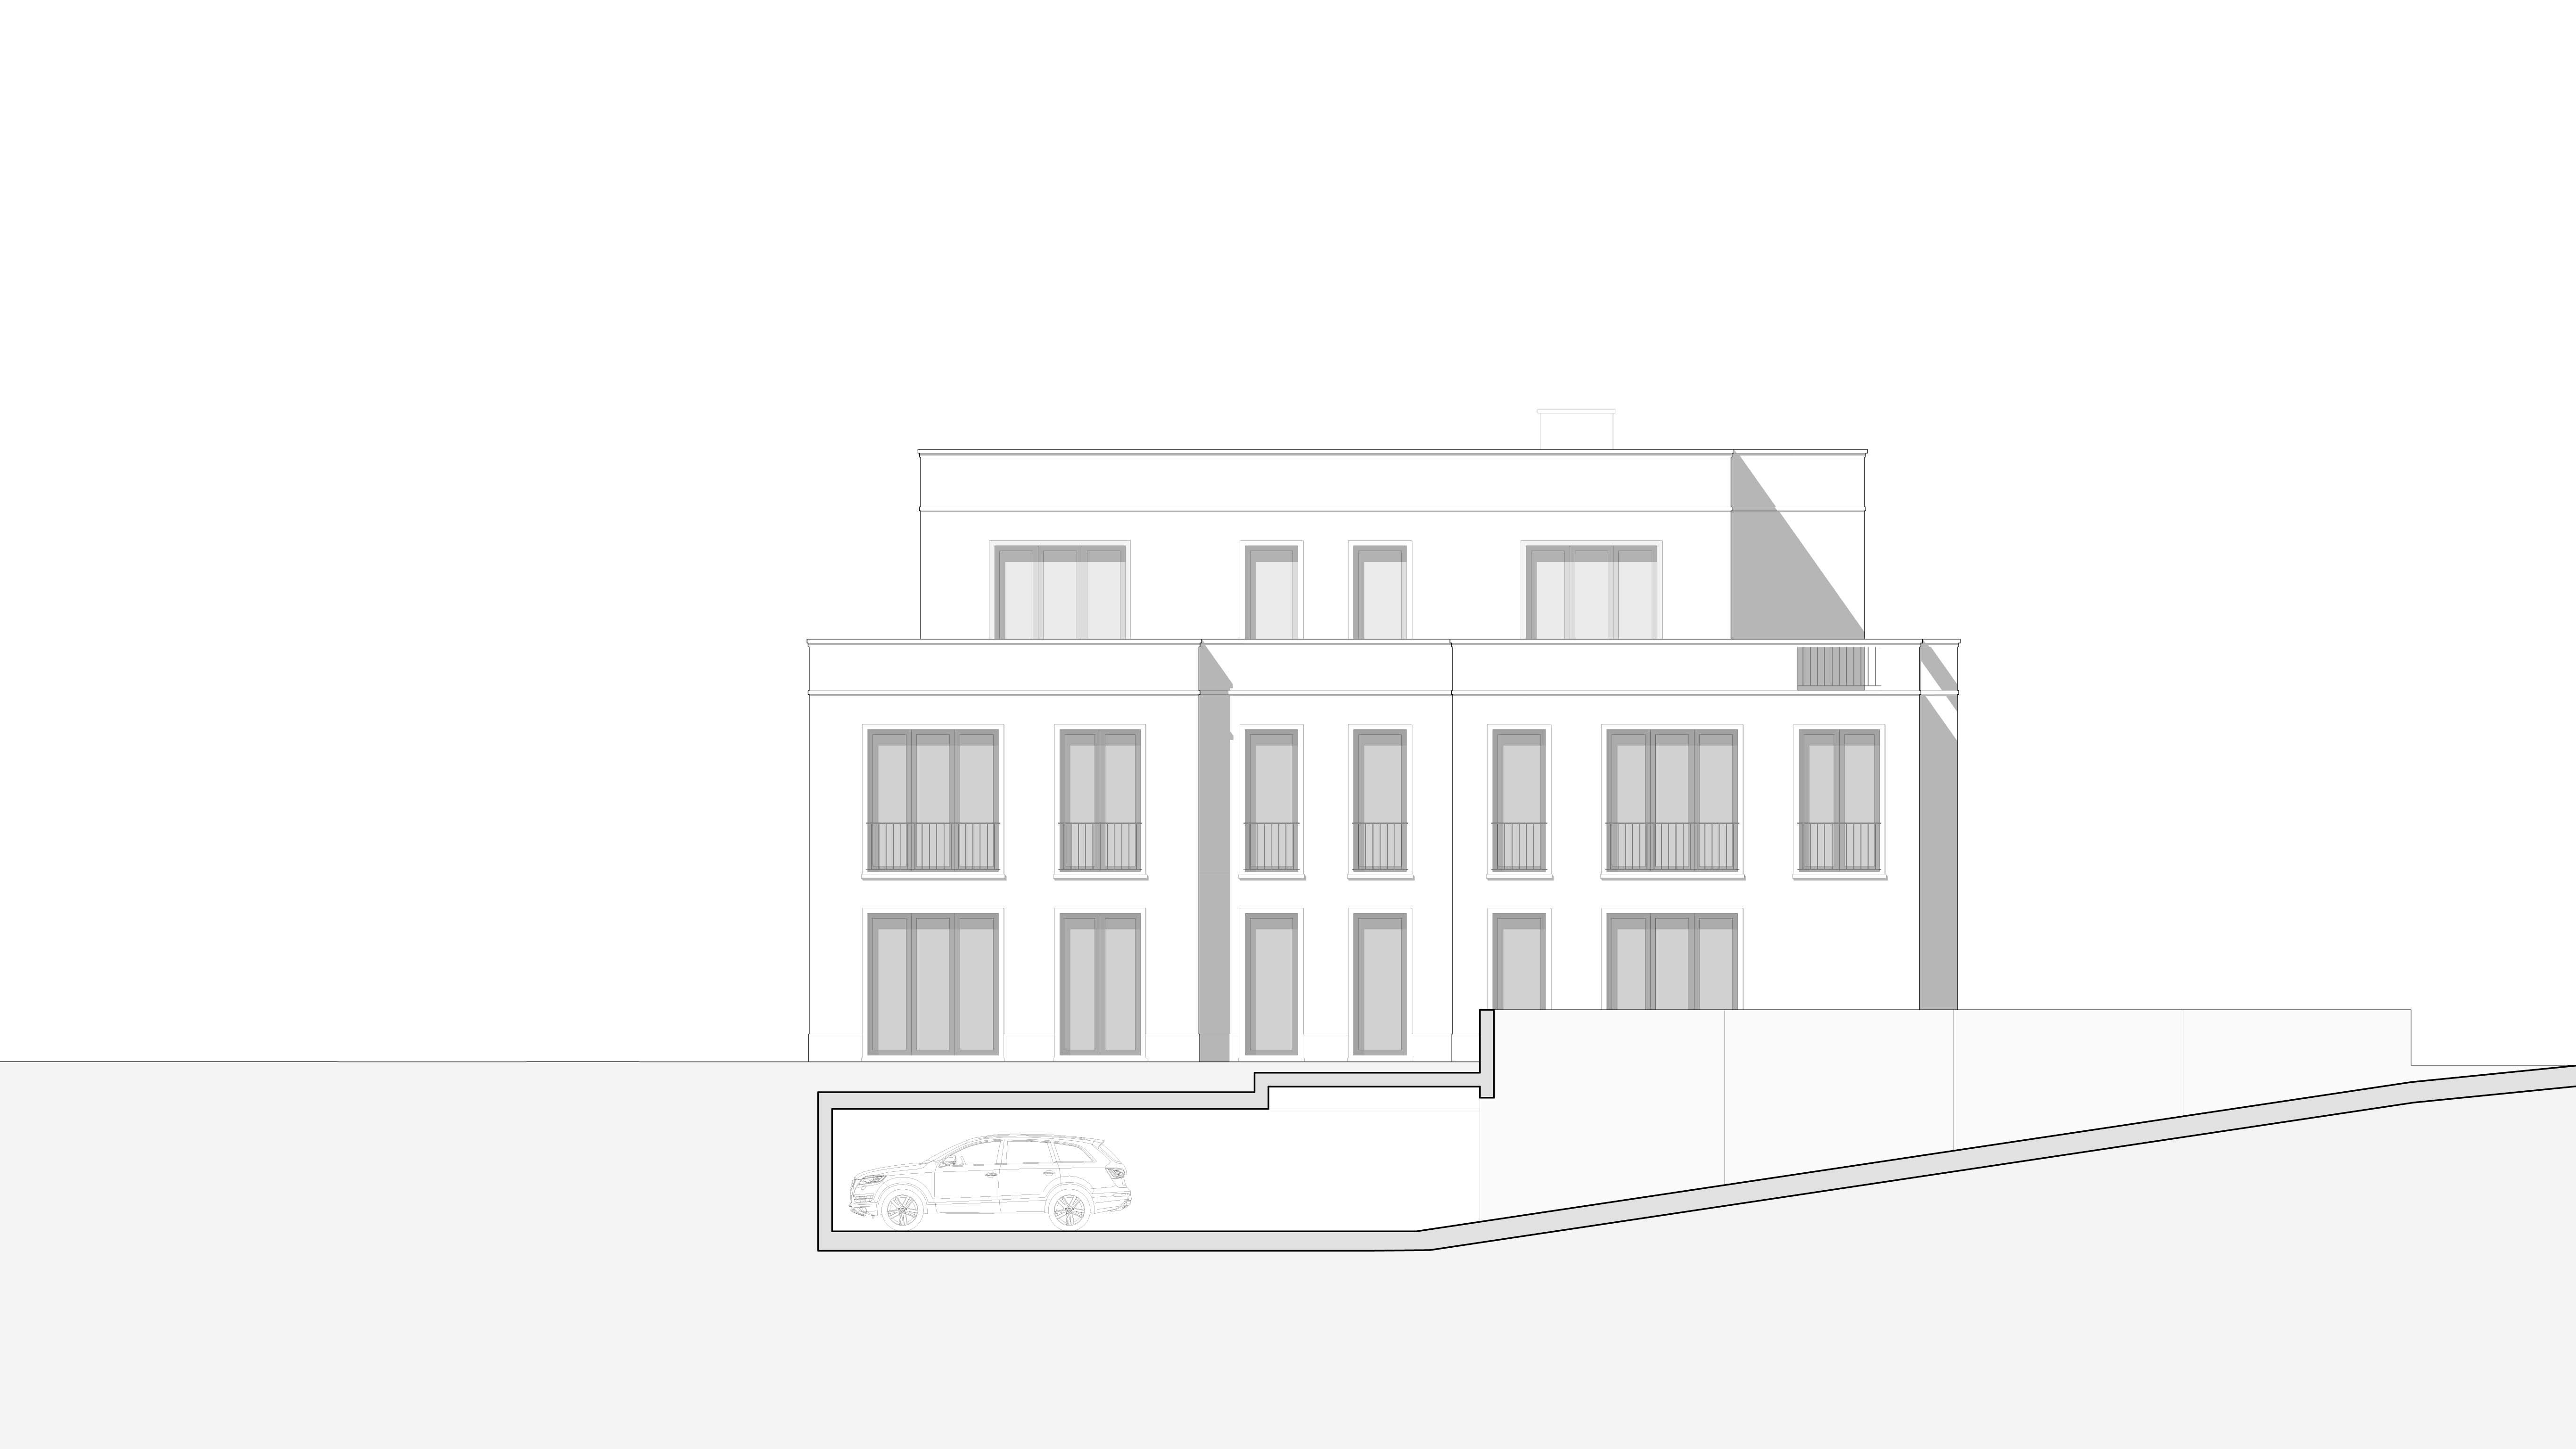 02 Villa Rosensteinweg 10